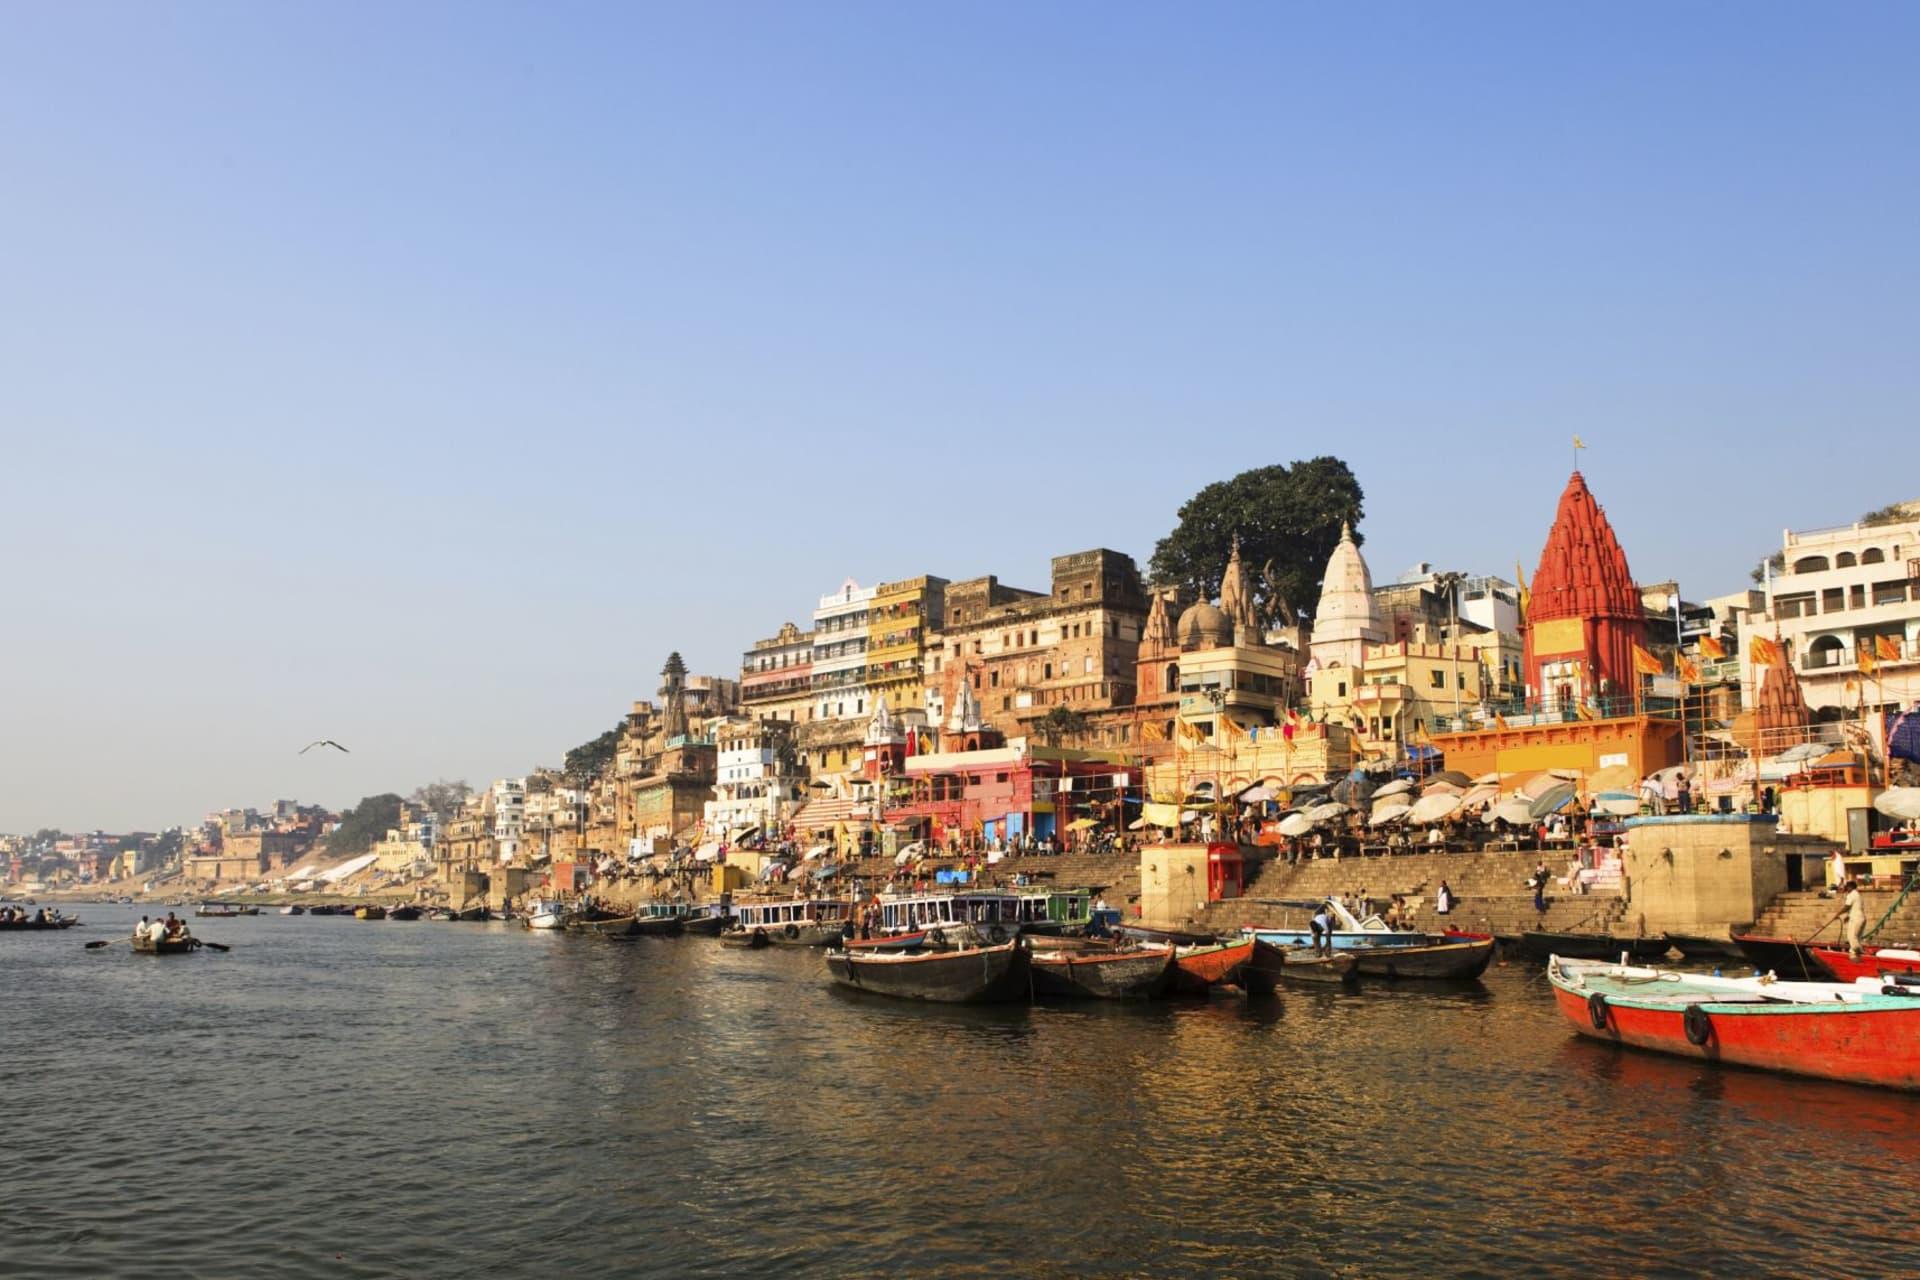 Varanasi: view from the river